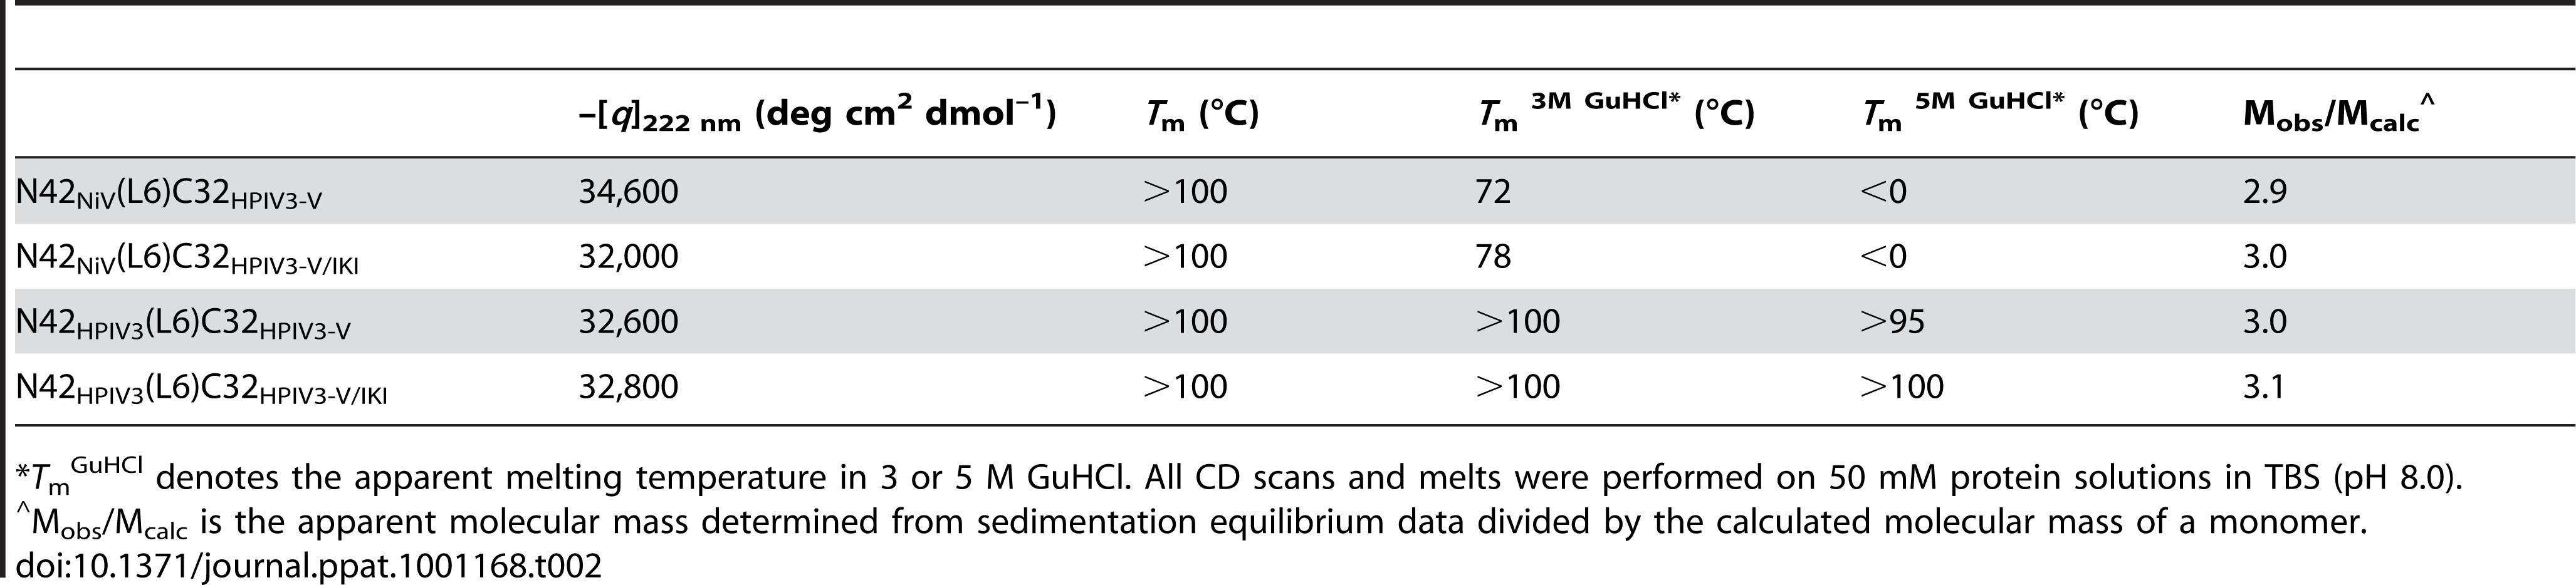 Biophysical data of mutant N42(L6)C32 polypeptides.